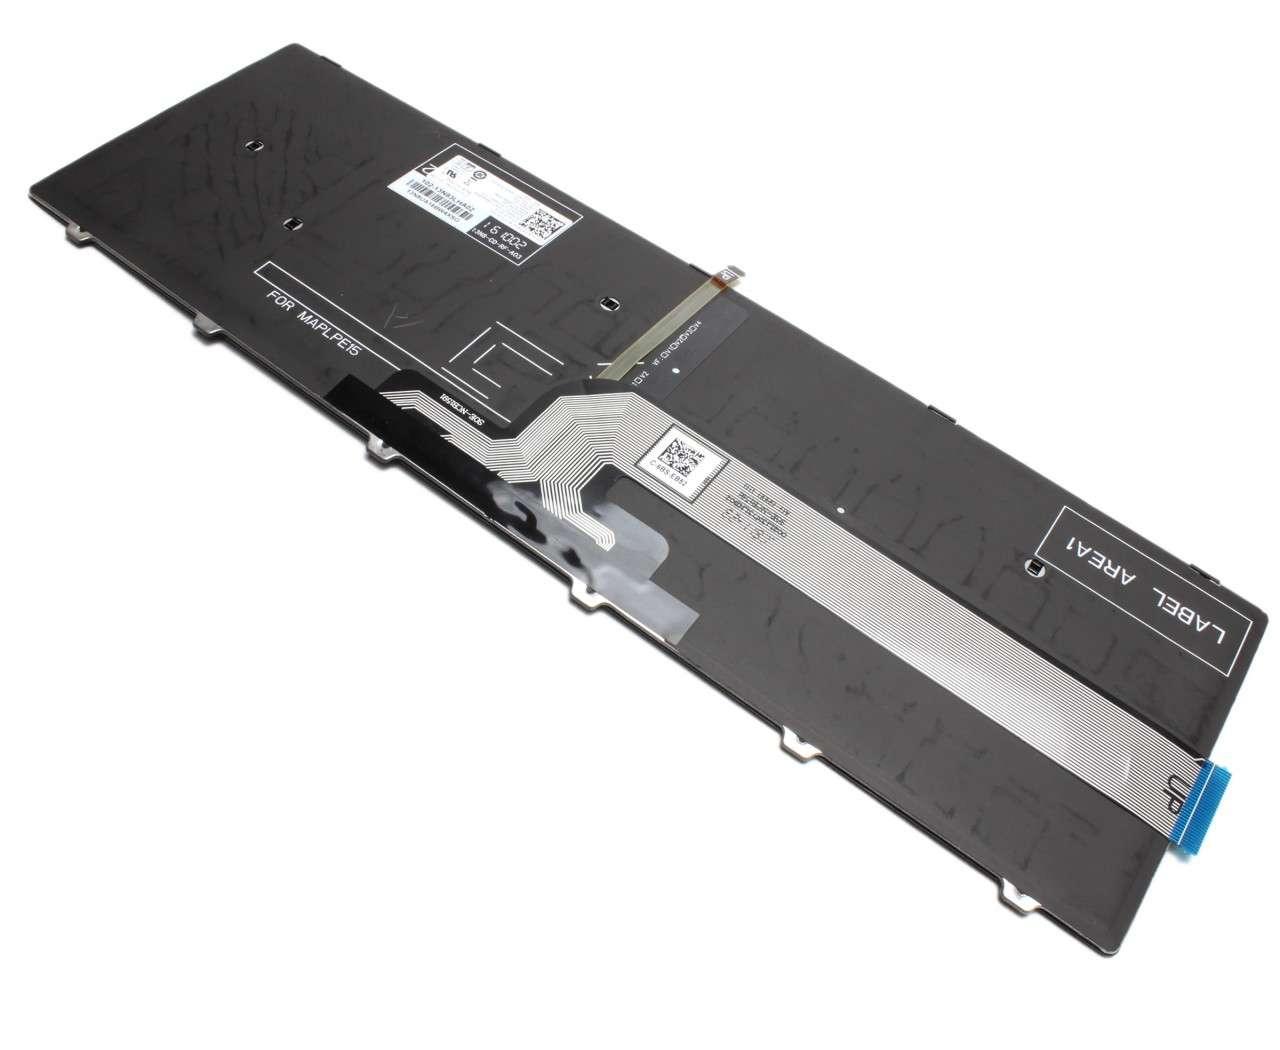 Tastatura Dell Inspiron 15 5577 iluminata backlit imagine